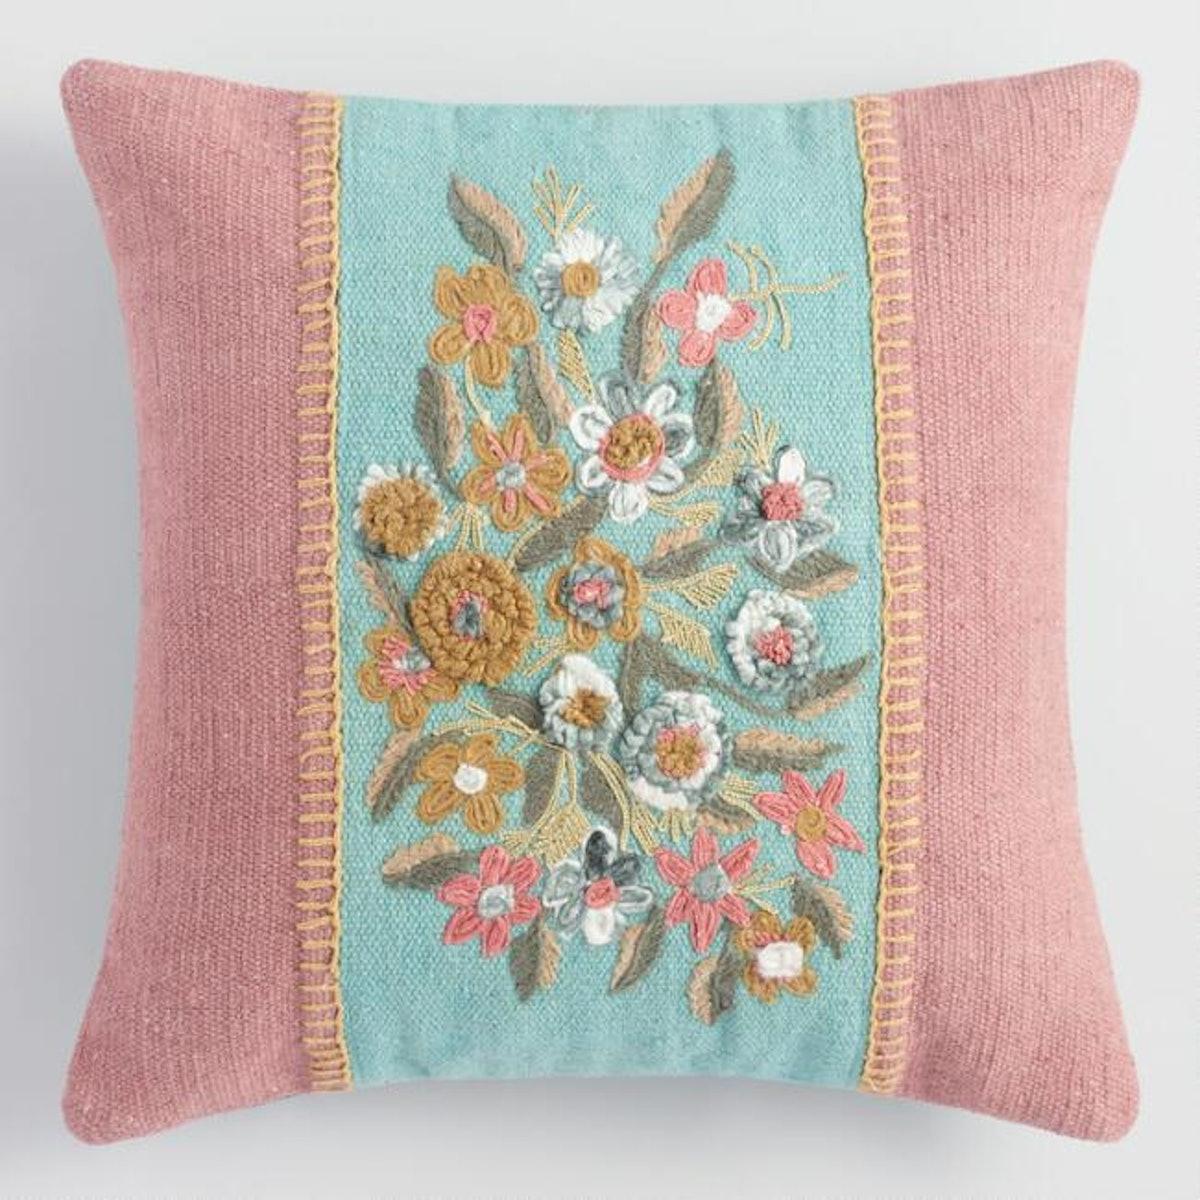 Large Blush Garden Floral Throw Pillow